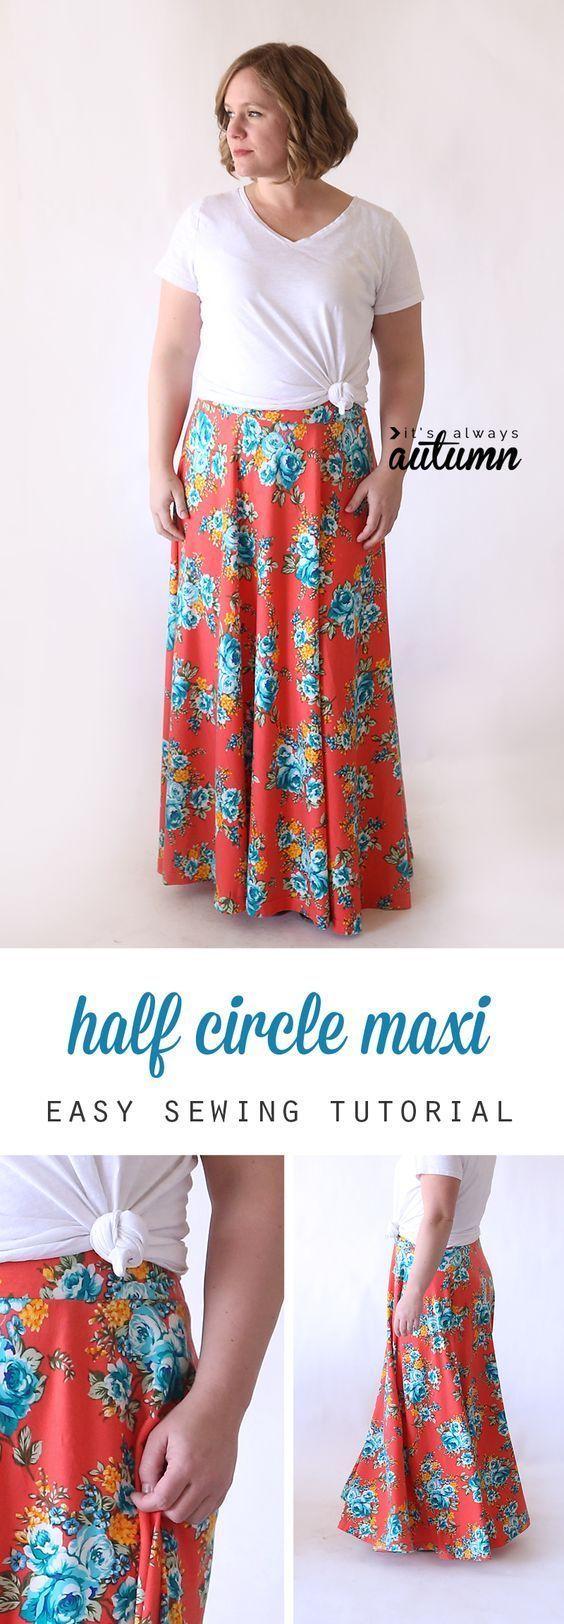 Best 25+ Diy maxi skirt ideas on Pinterest | Maxi skirt tutorial ...